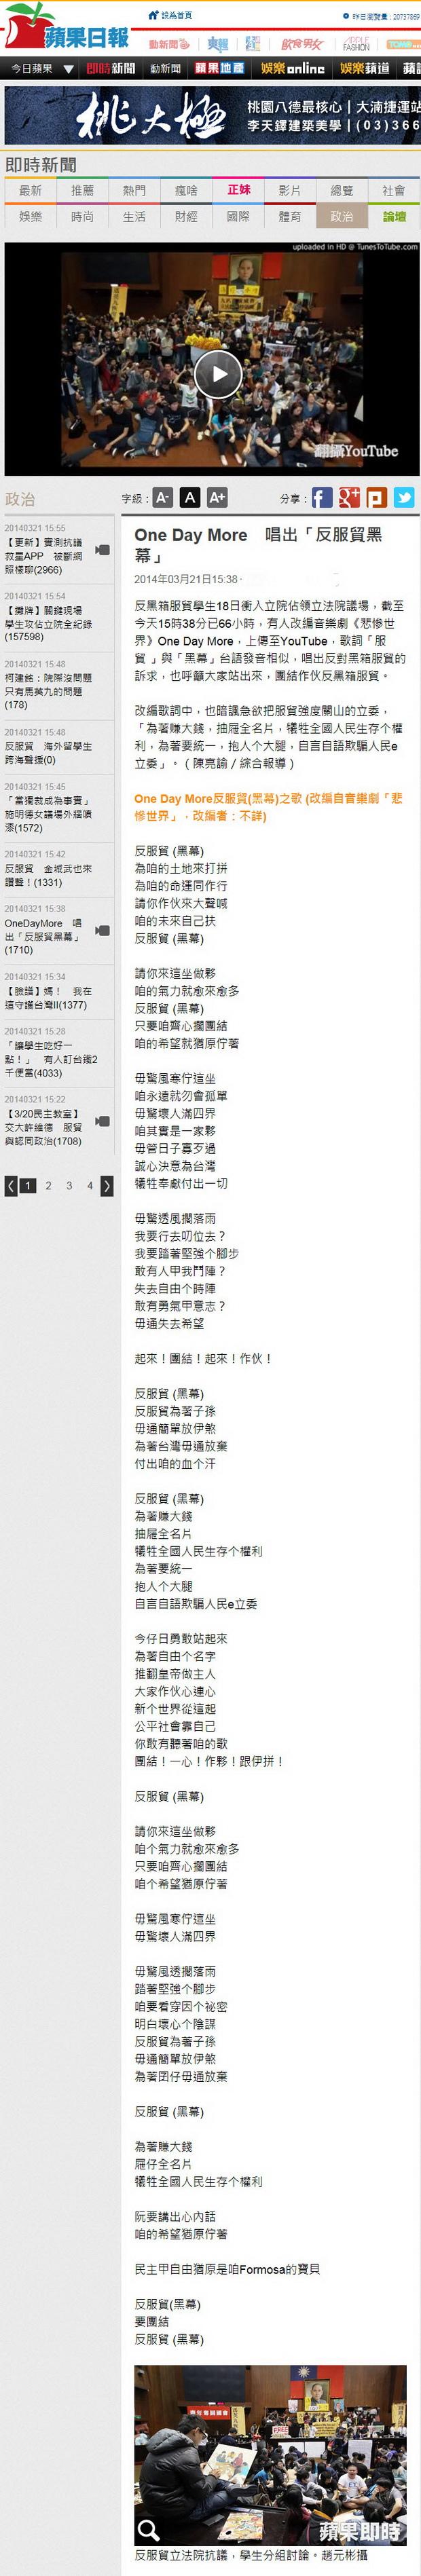 One Day More唱出「反服貿黑幕」 -2014.03.21.jpg